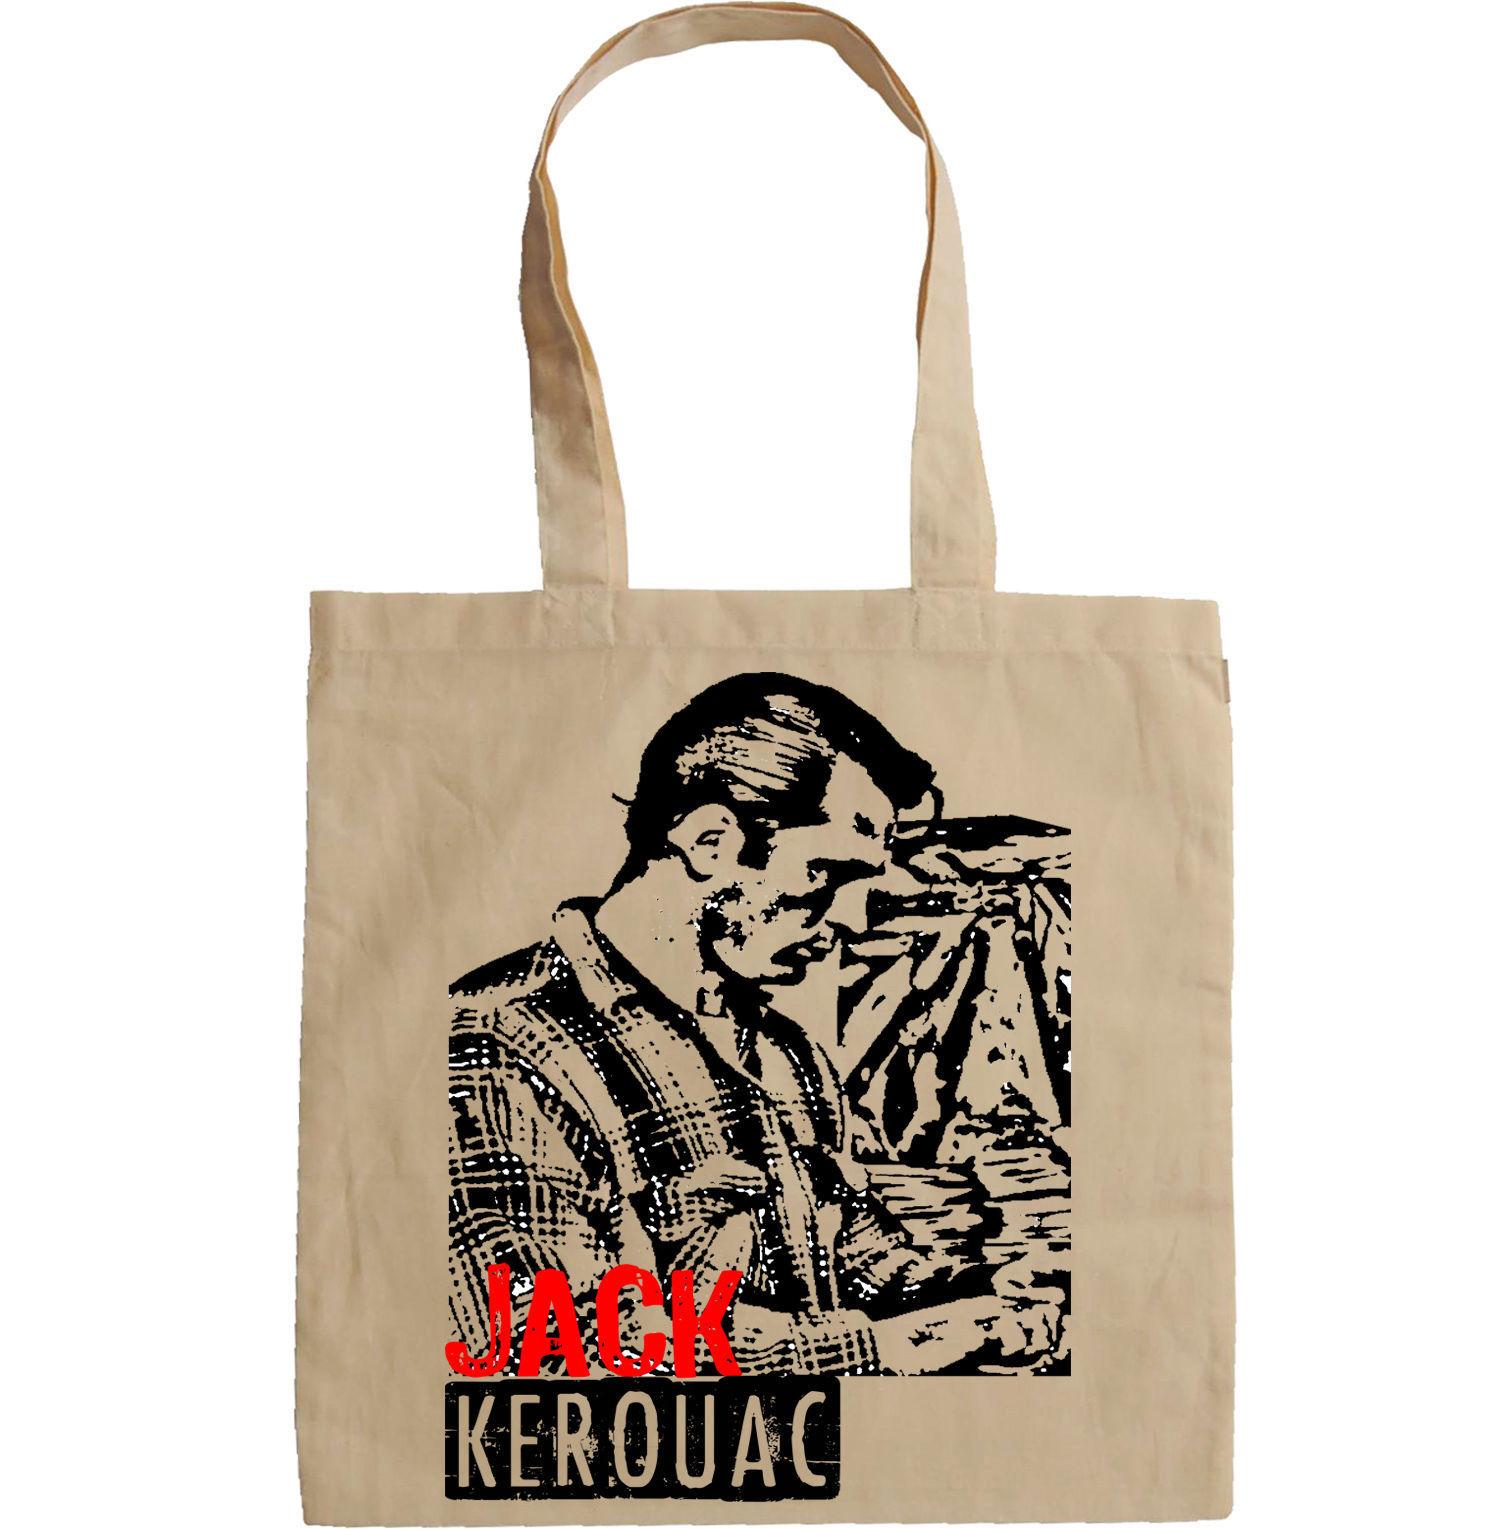 JACK KEROUAC - NEW AMAZING GRAPHIC HAND BAG/TOTE BAG